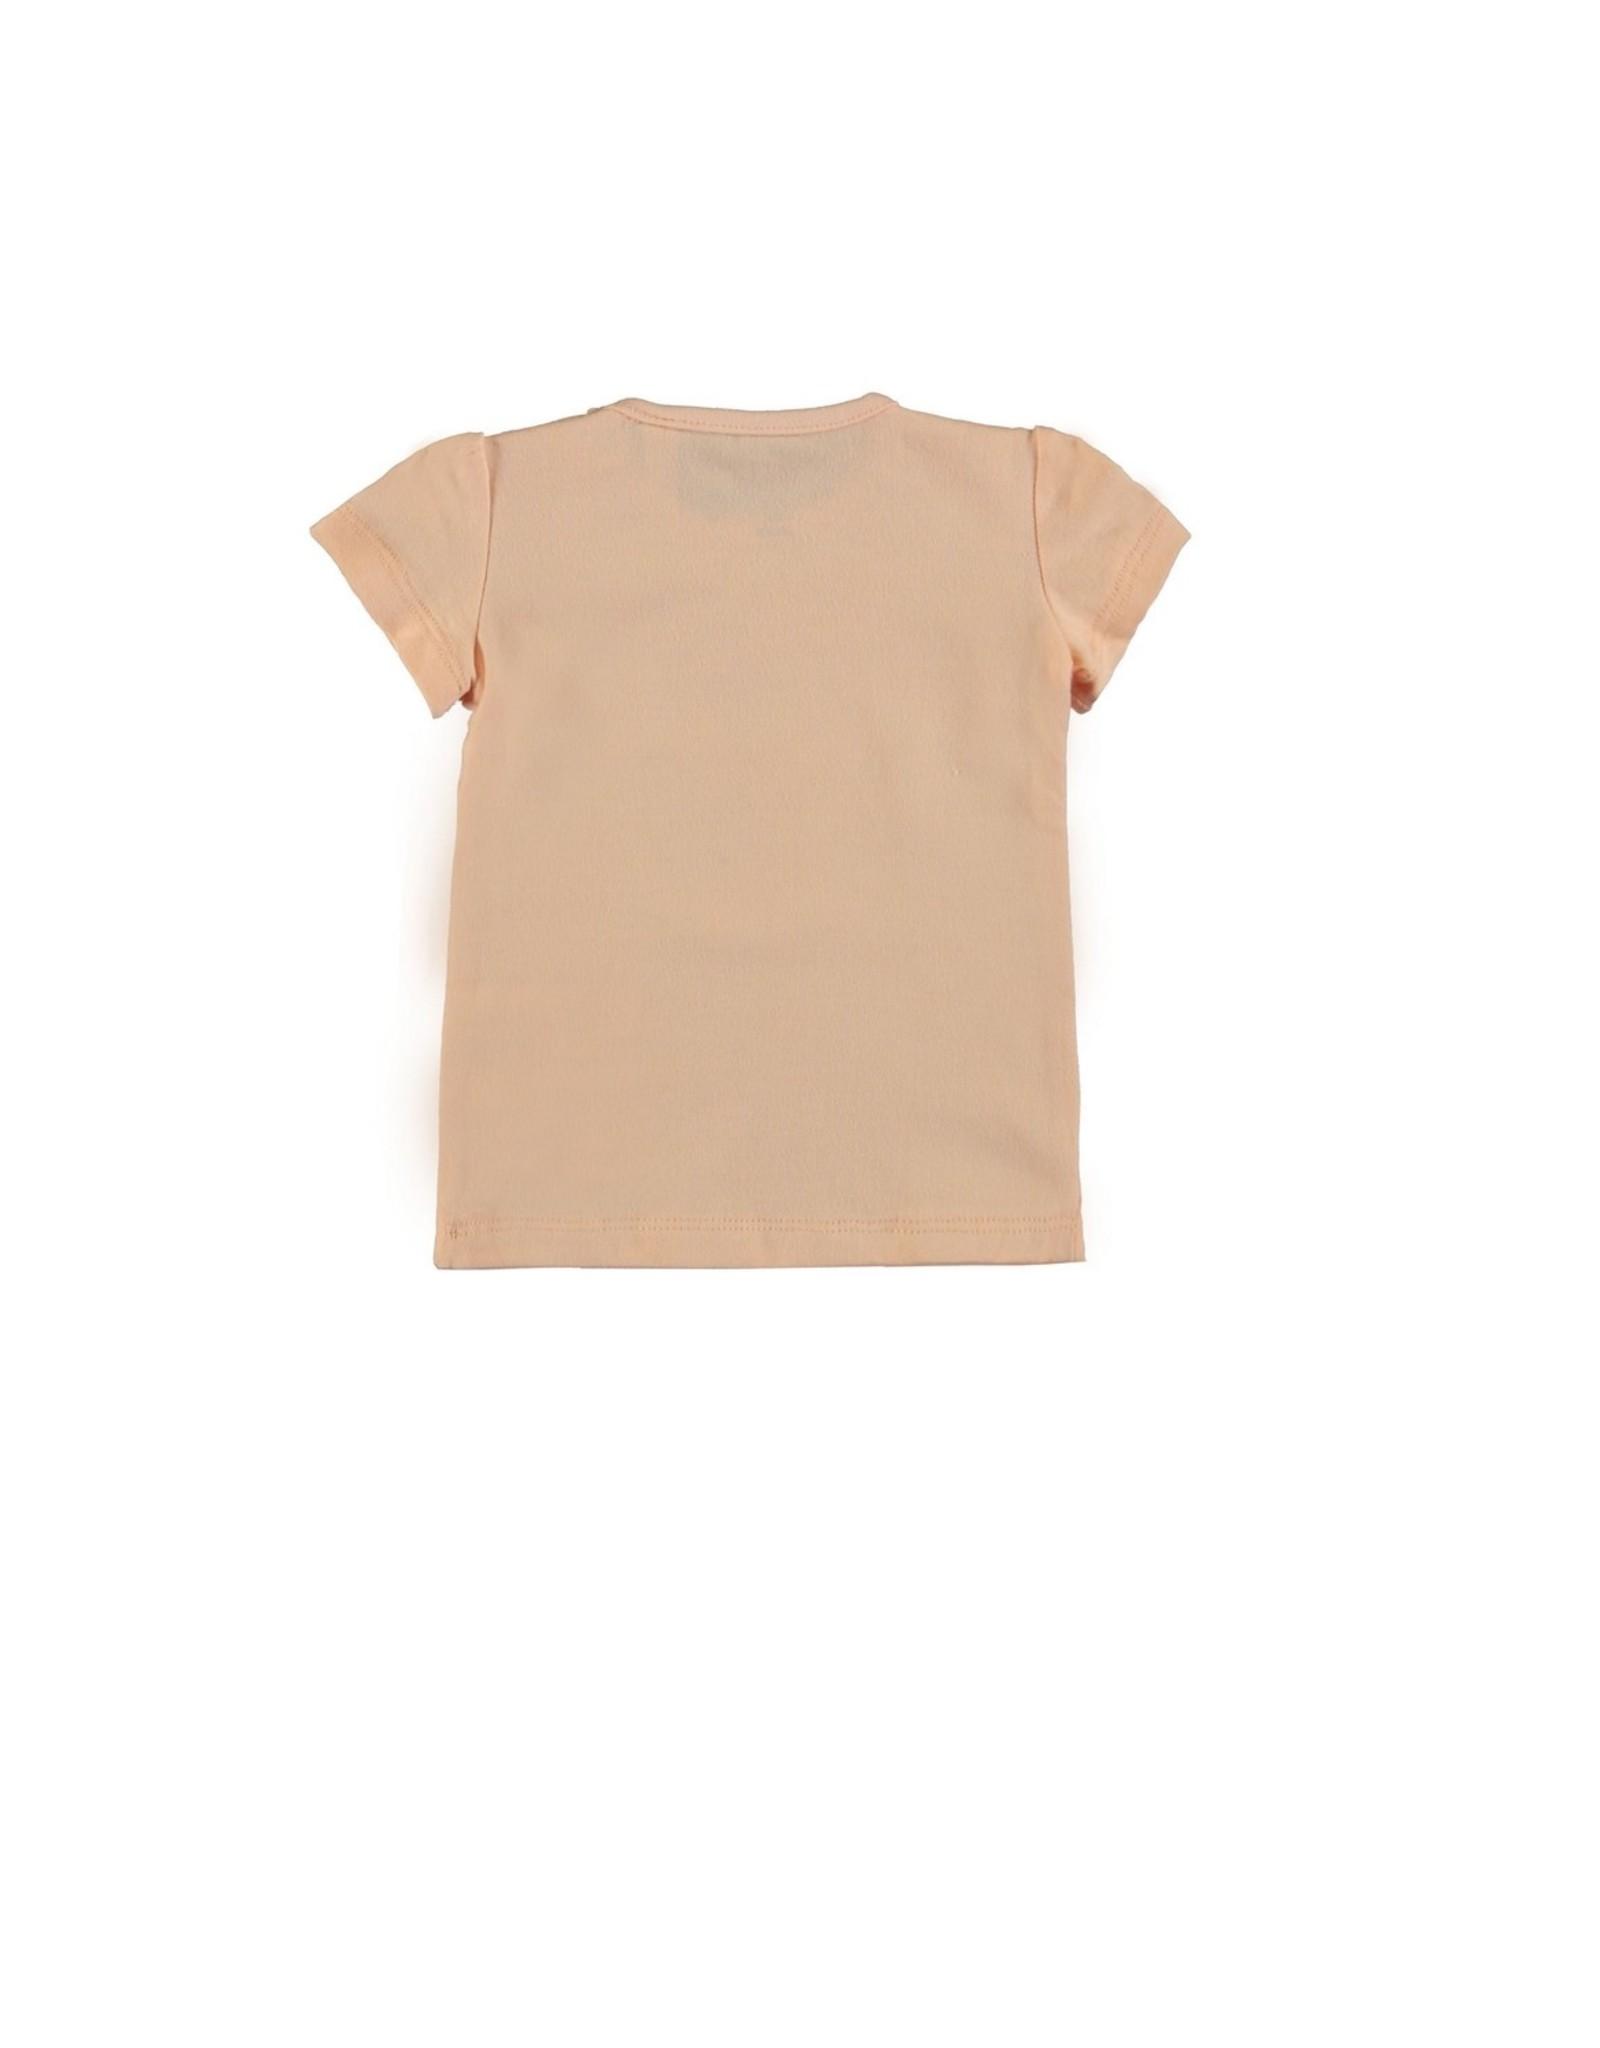 Bampidano Baby Girls T-shirt s/s  plain LA VITA E BELLA / SUNNY DAY / C'EST BON, light pink